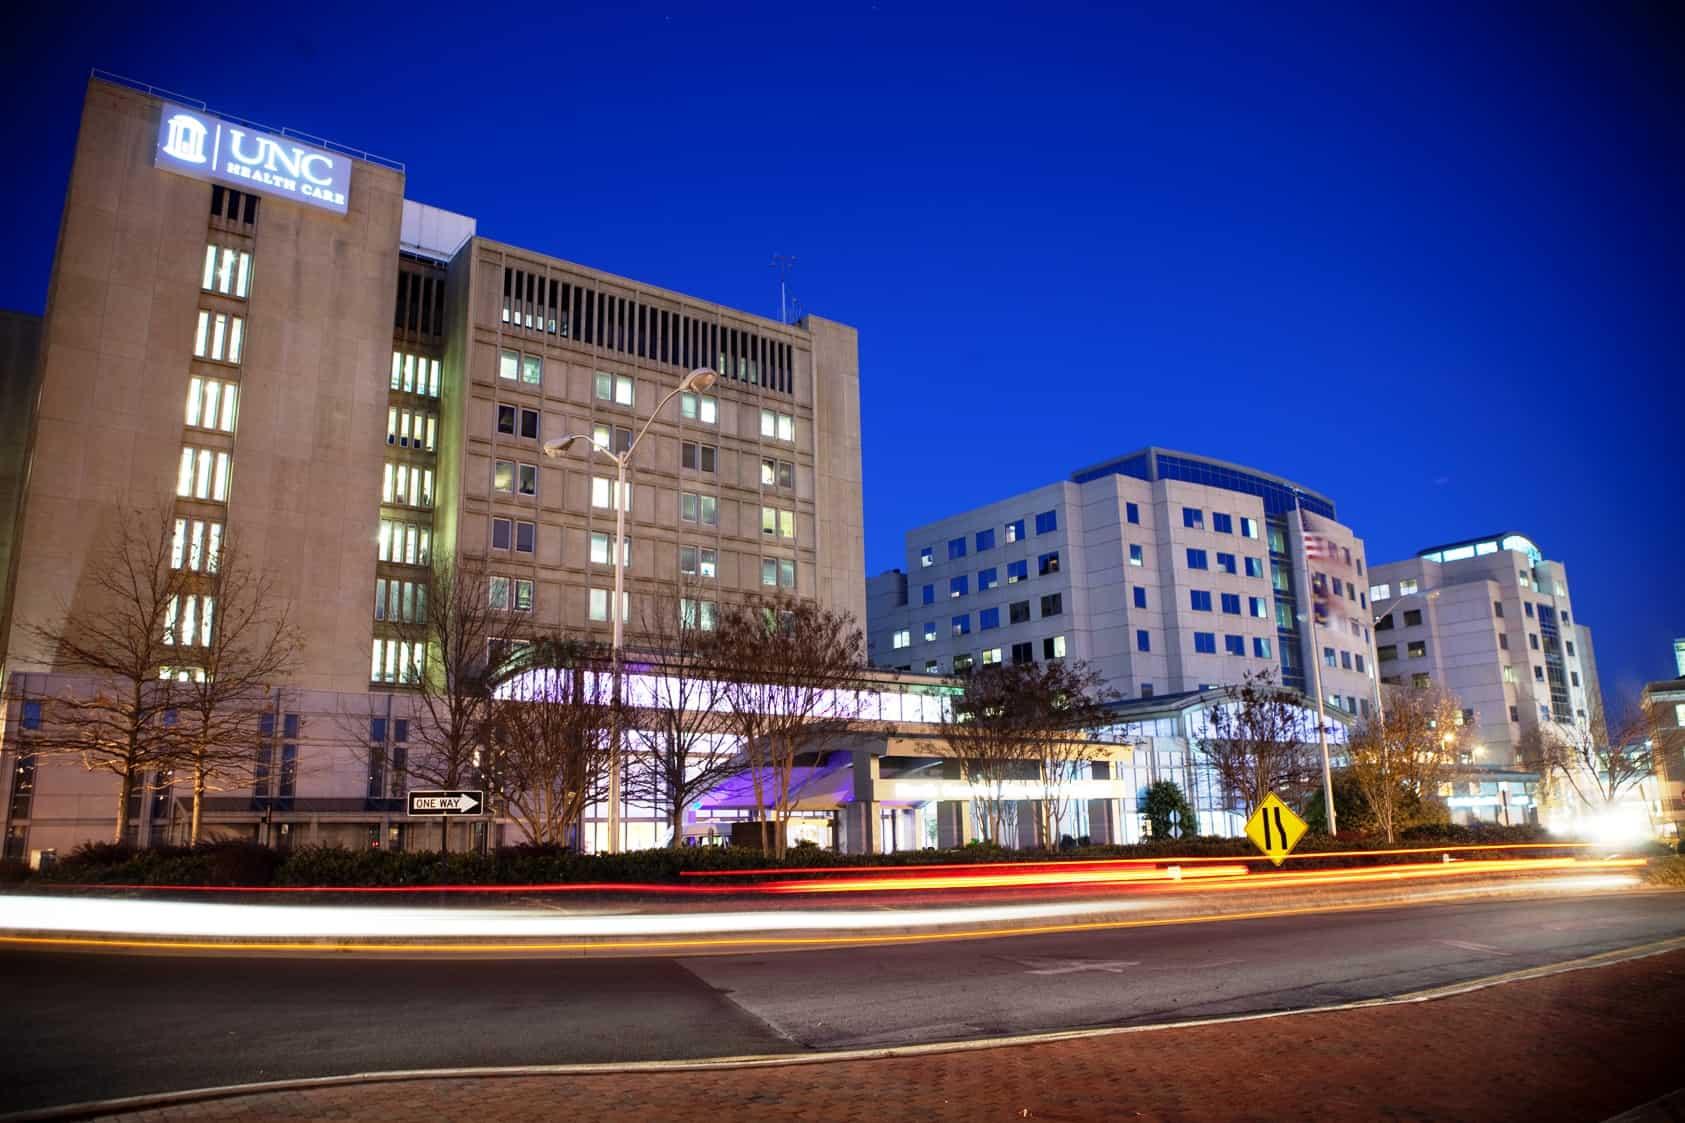 Legislators Vote For Governance Changes In Unc Health Care System